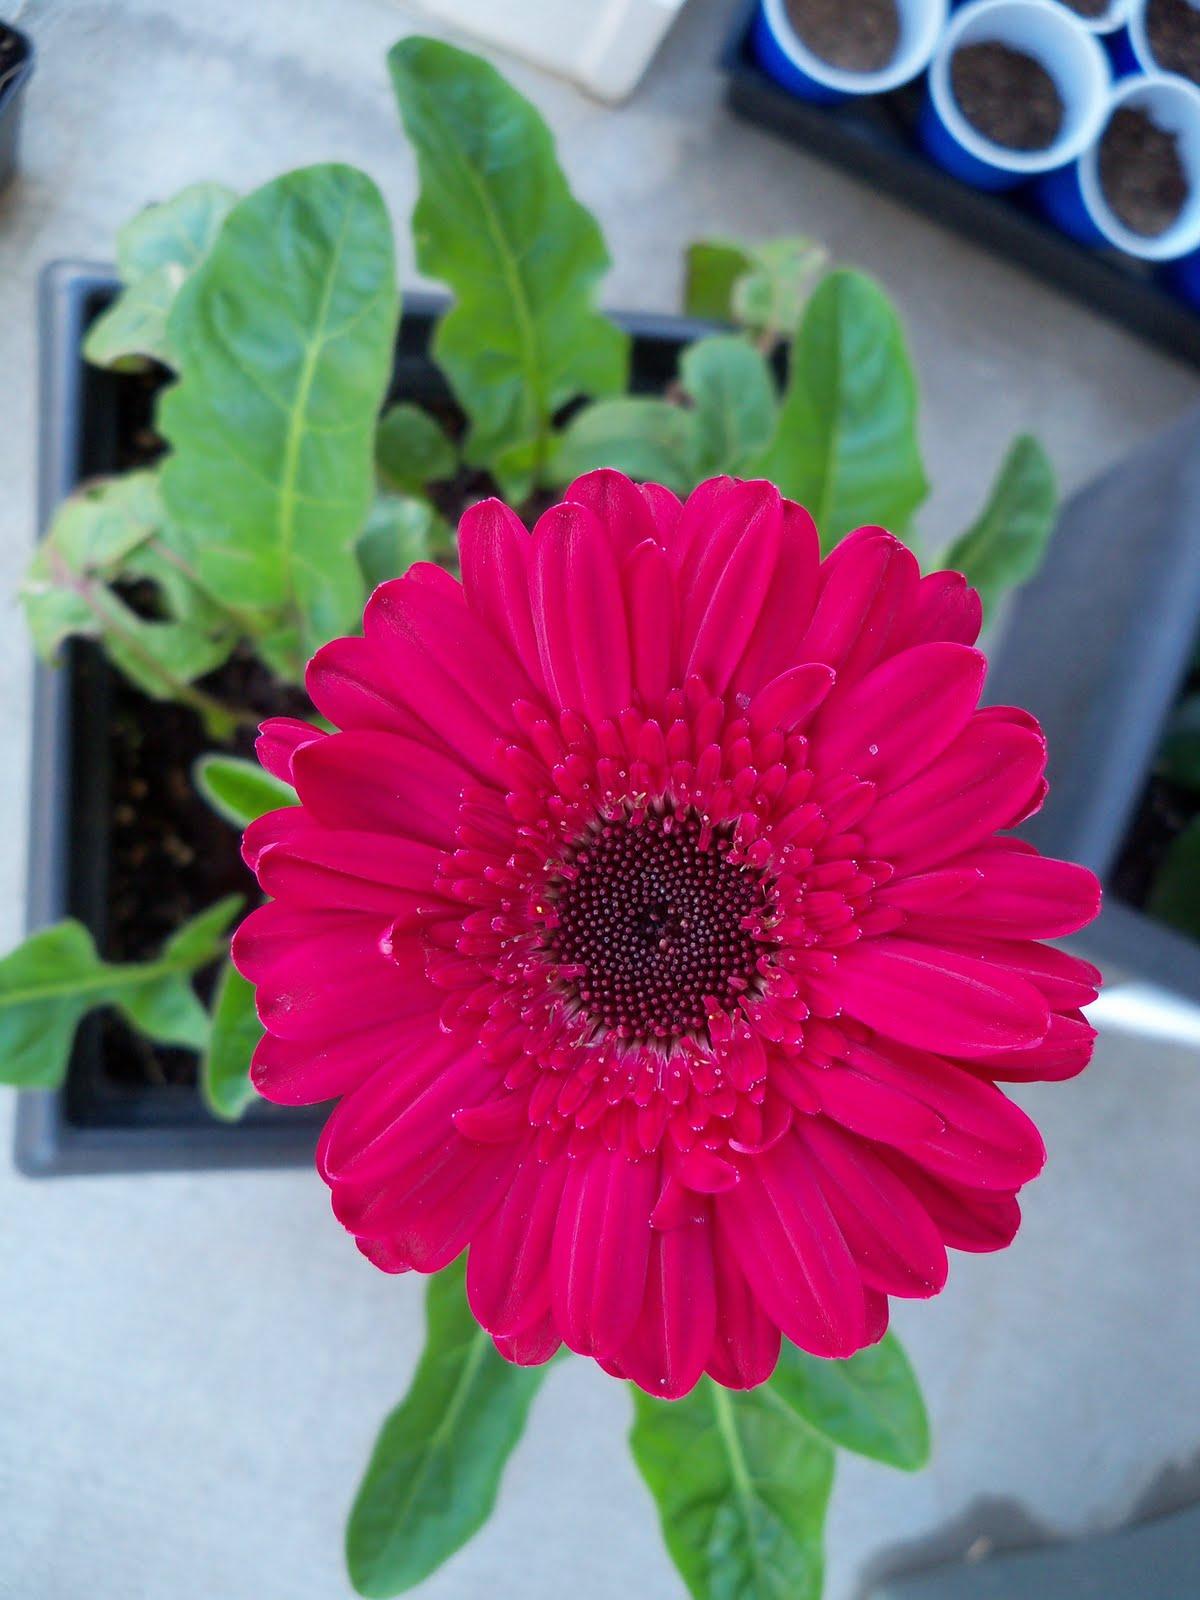 Gardening 2010 - 101_0481.JPG